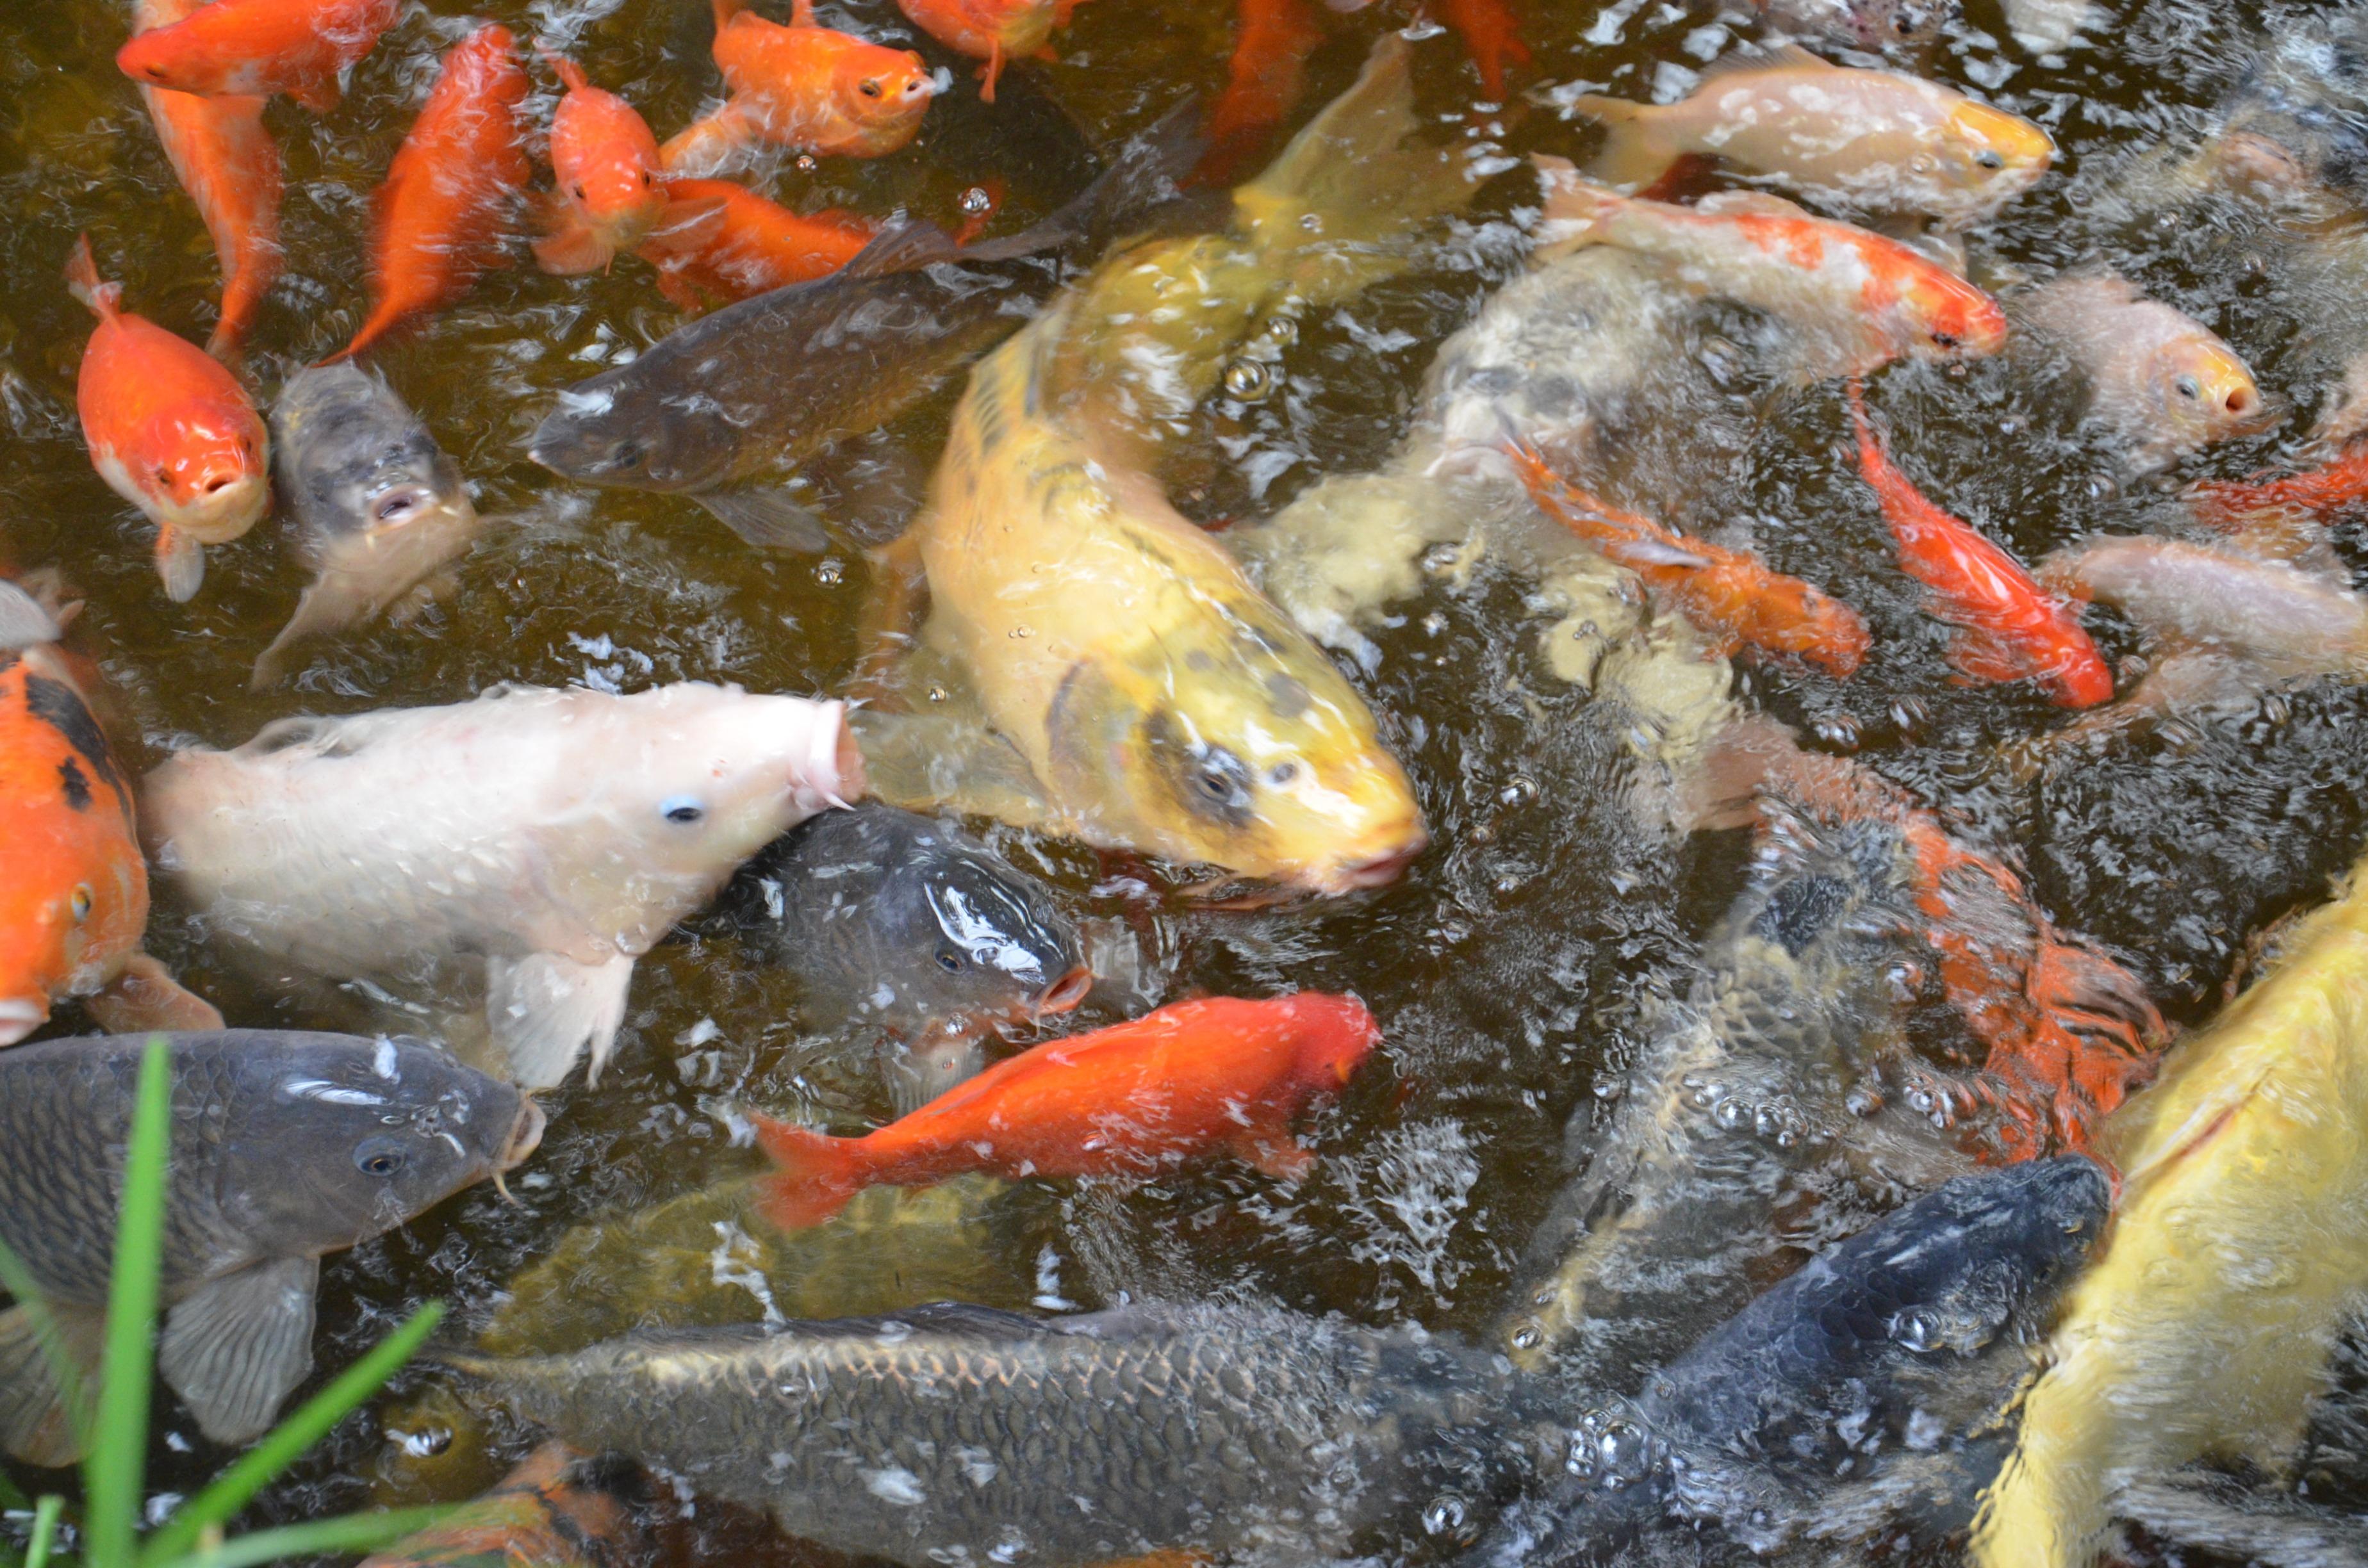 картинки рыб прудовых площадка маяка